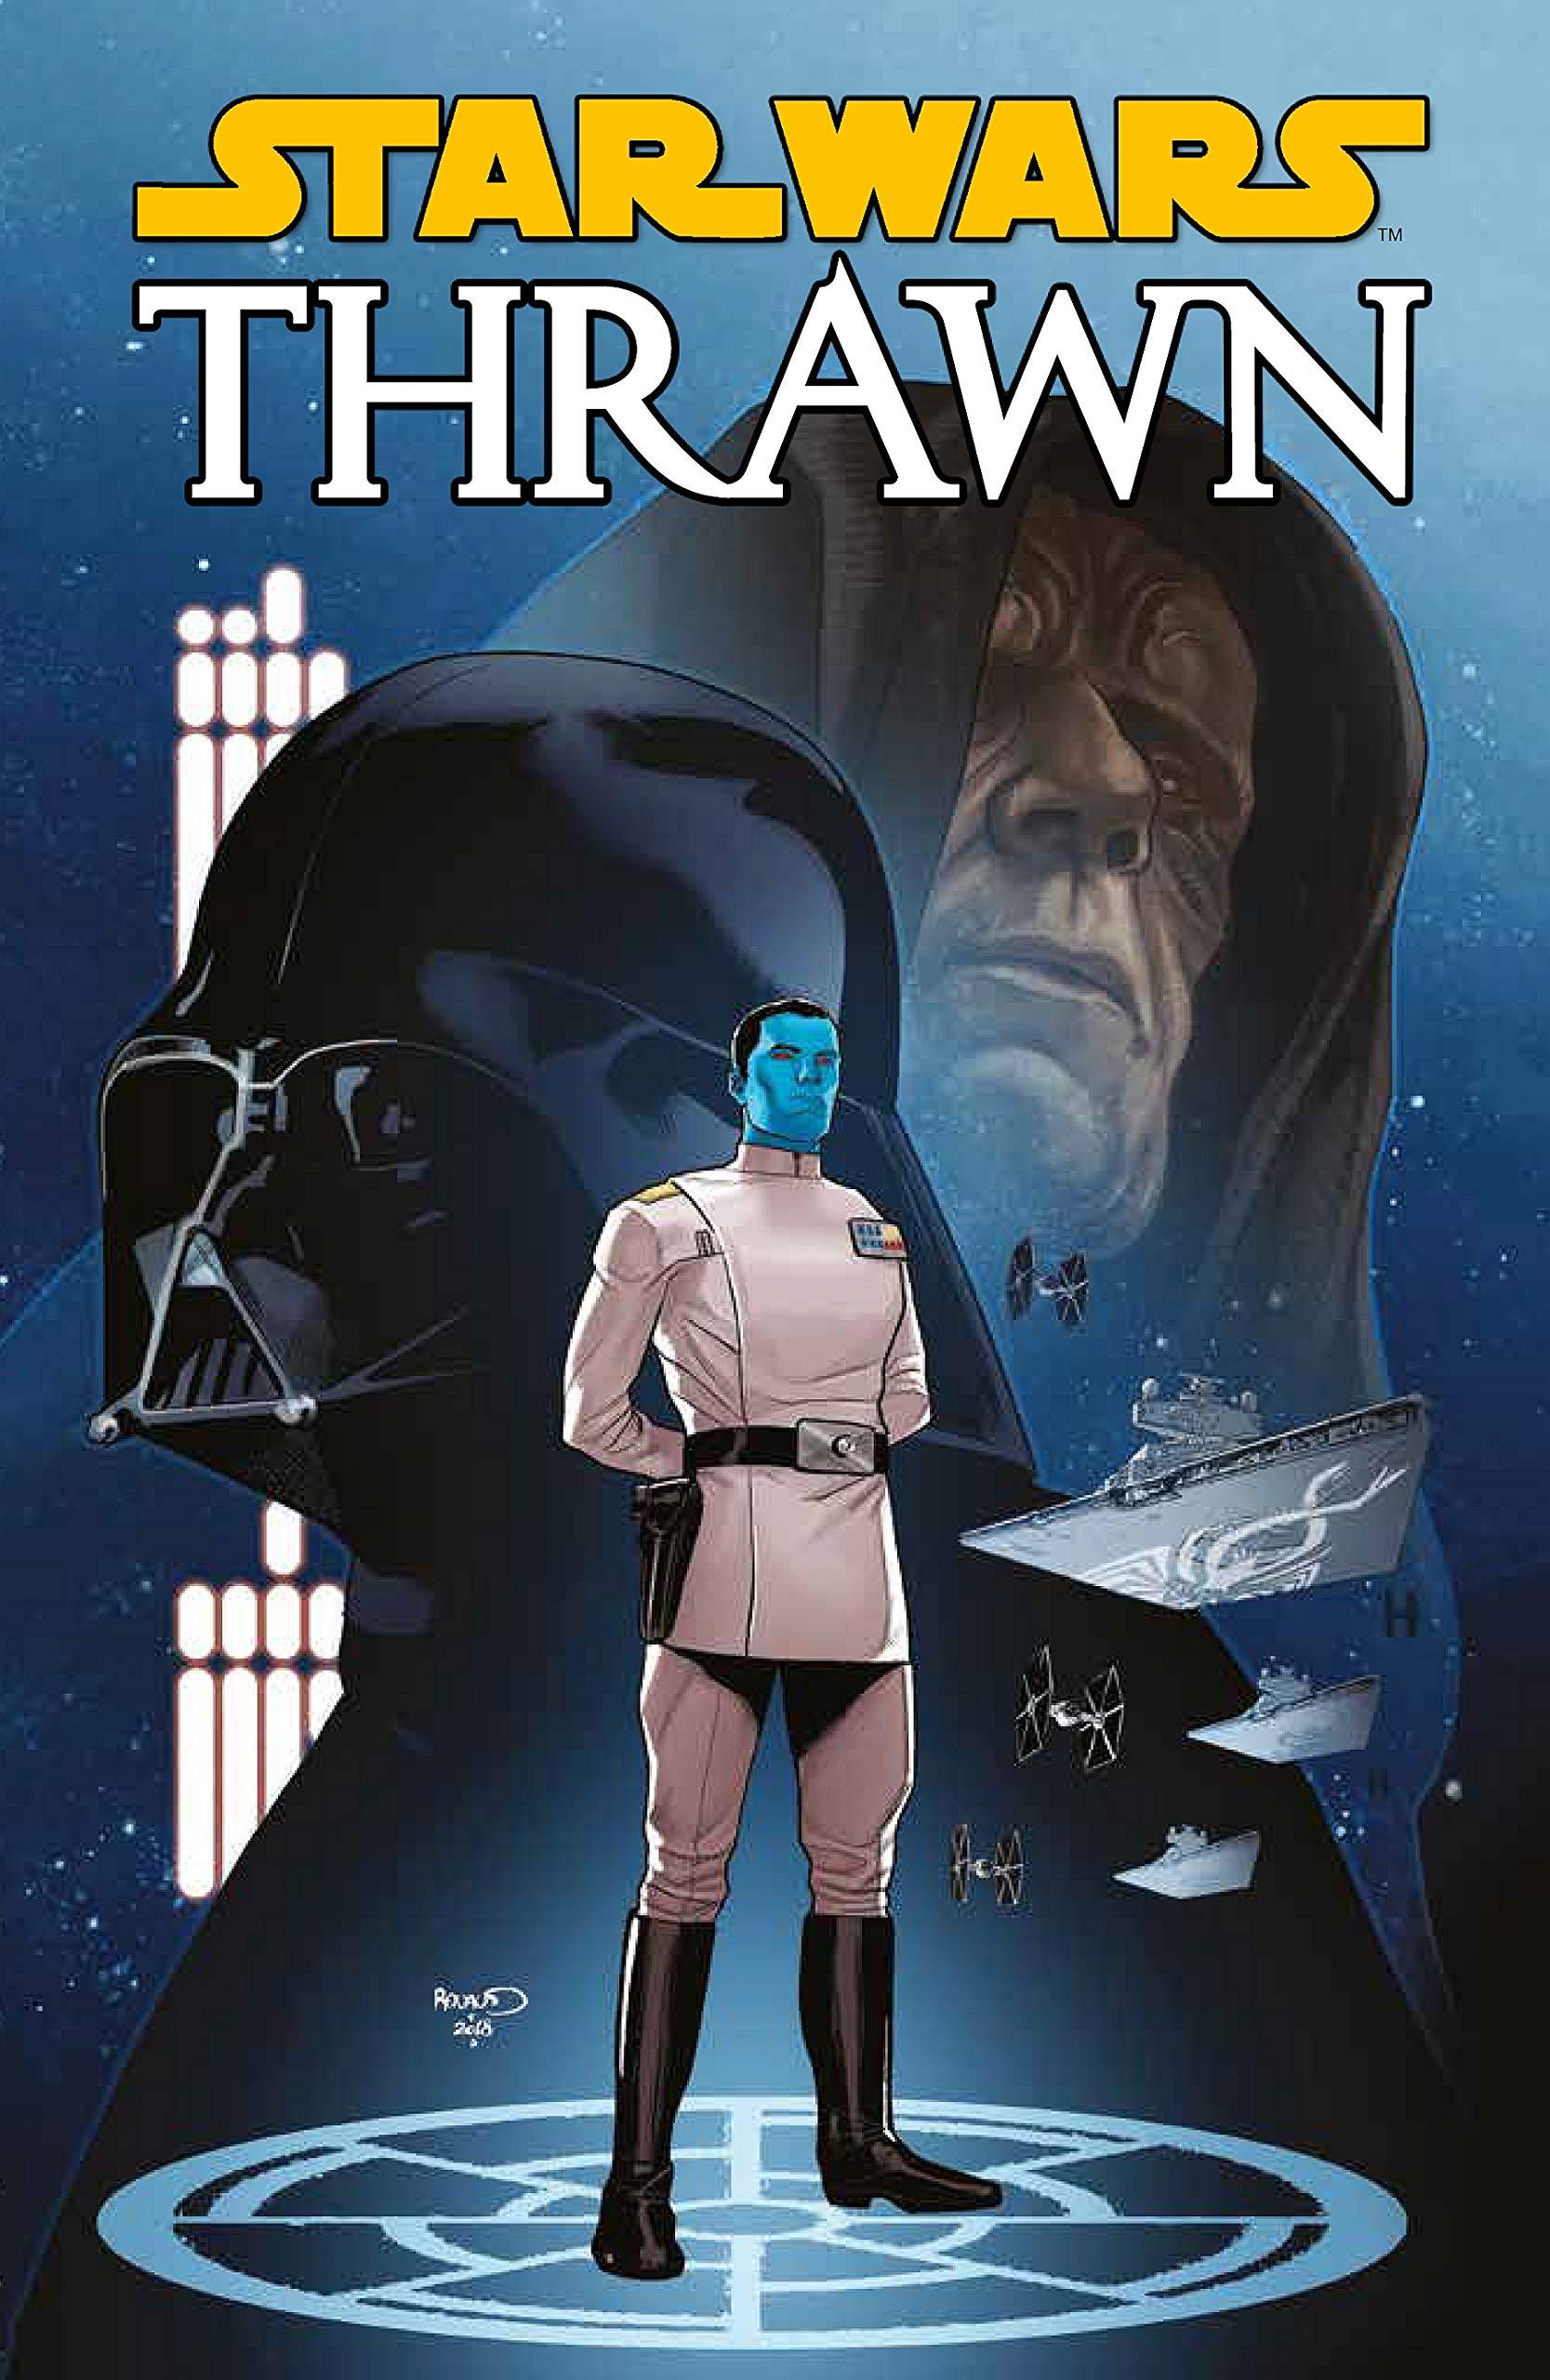 Thrawn (24.09.2019)